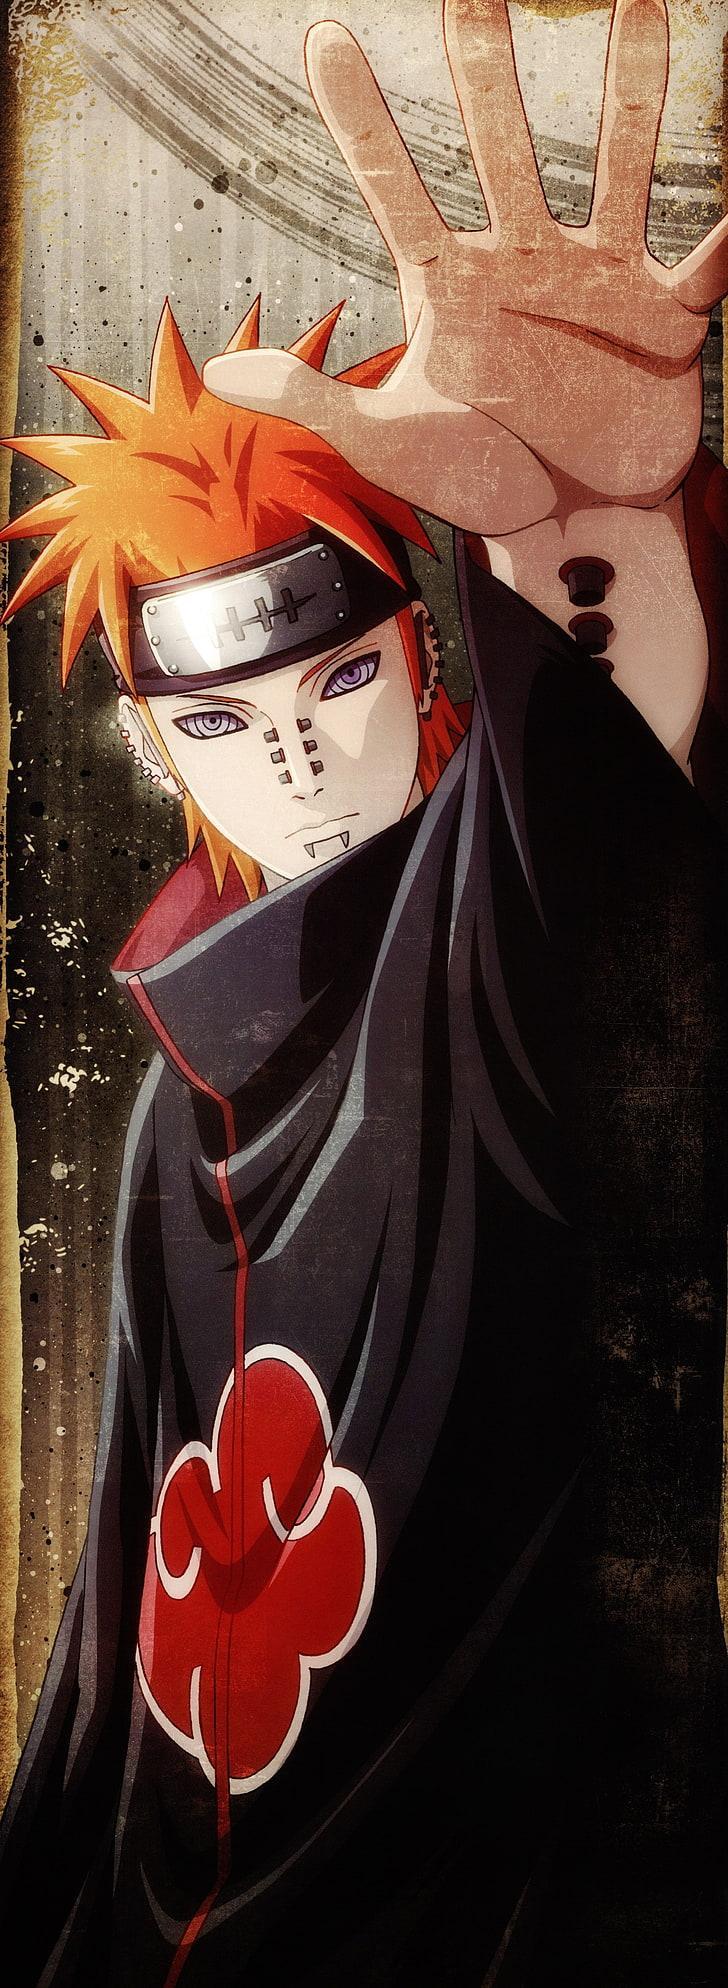 Naruto Profile Wallpapers Wallpaper Cave